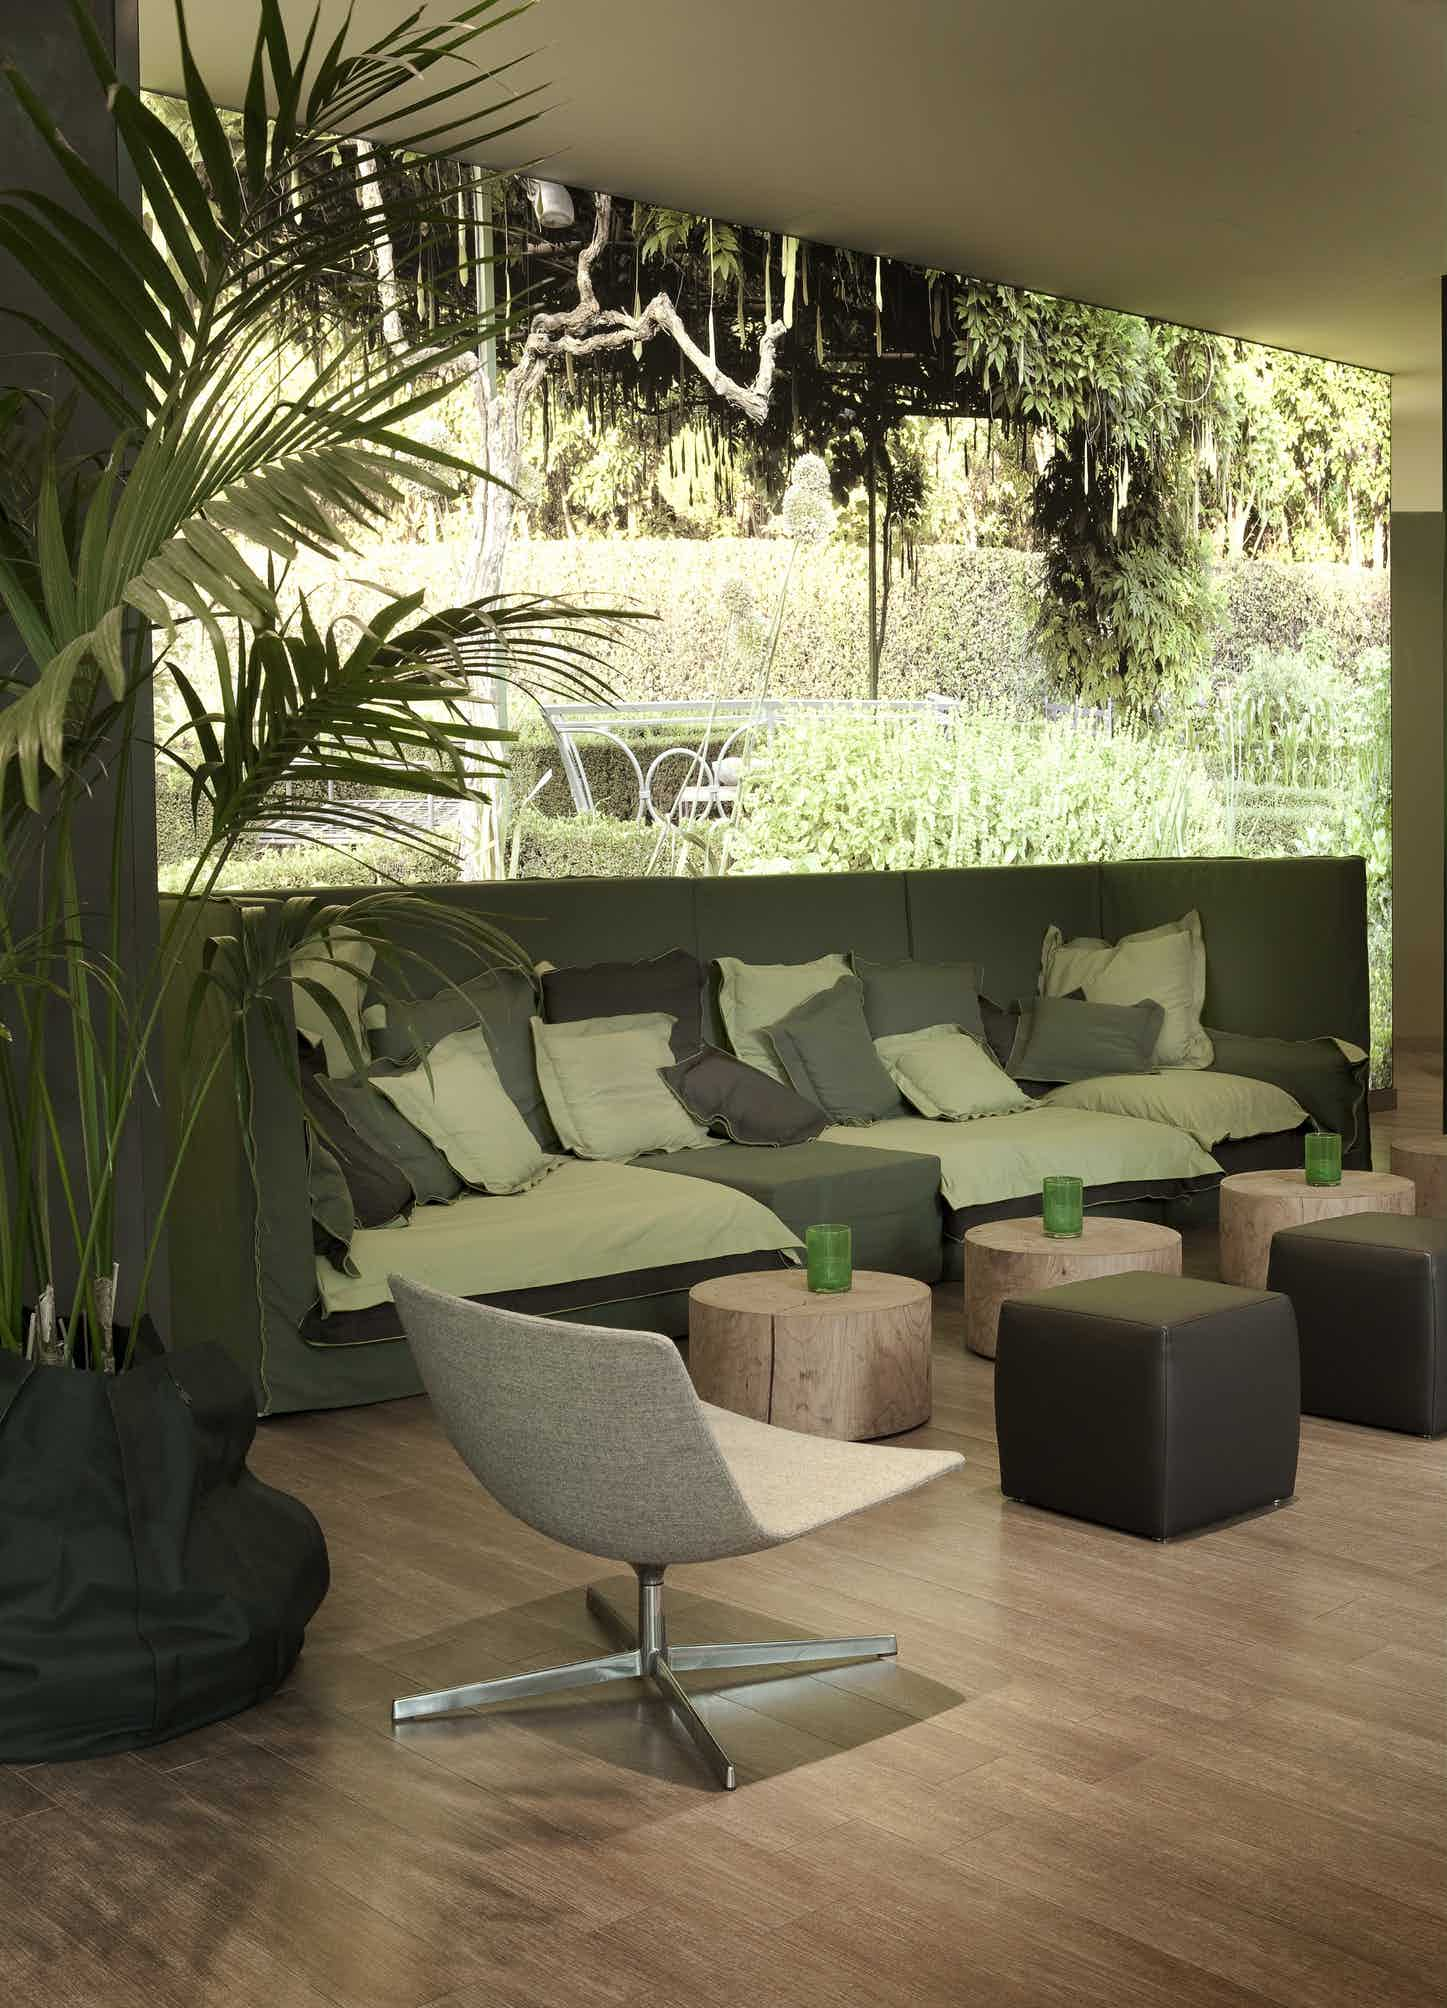 Linteloo green jans new sofa institu haute living